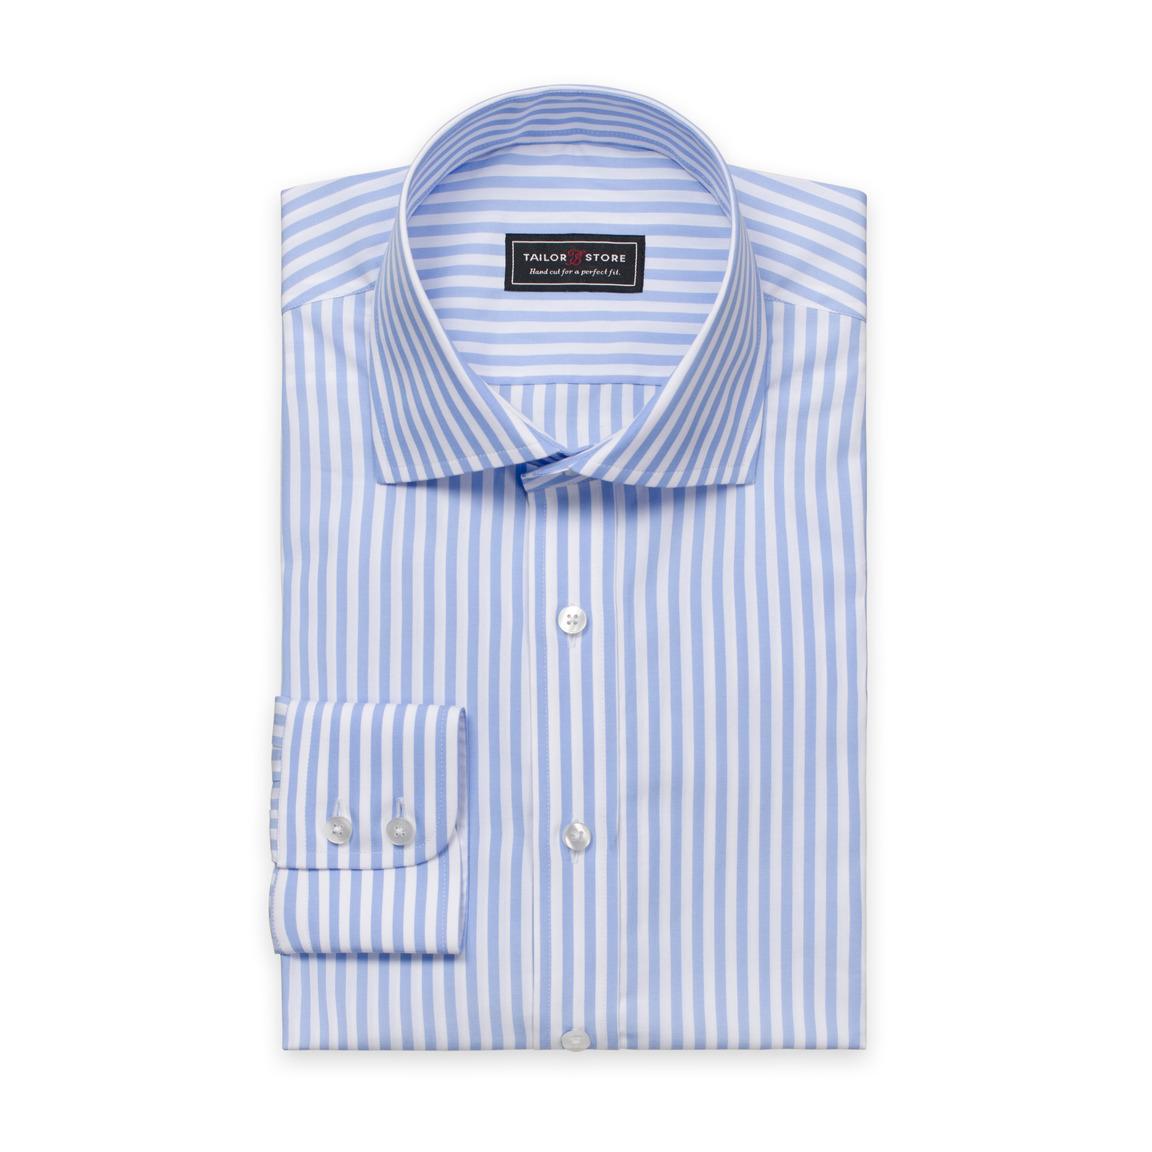 Weiß/blau gestreiftes Poplin-Hemd